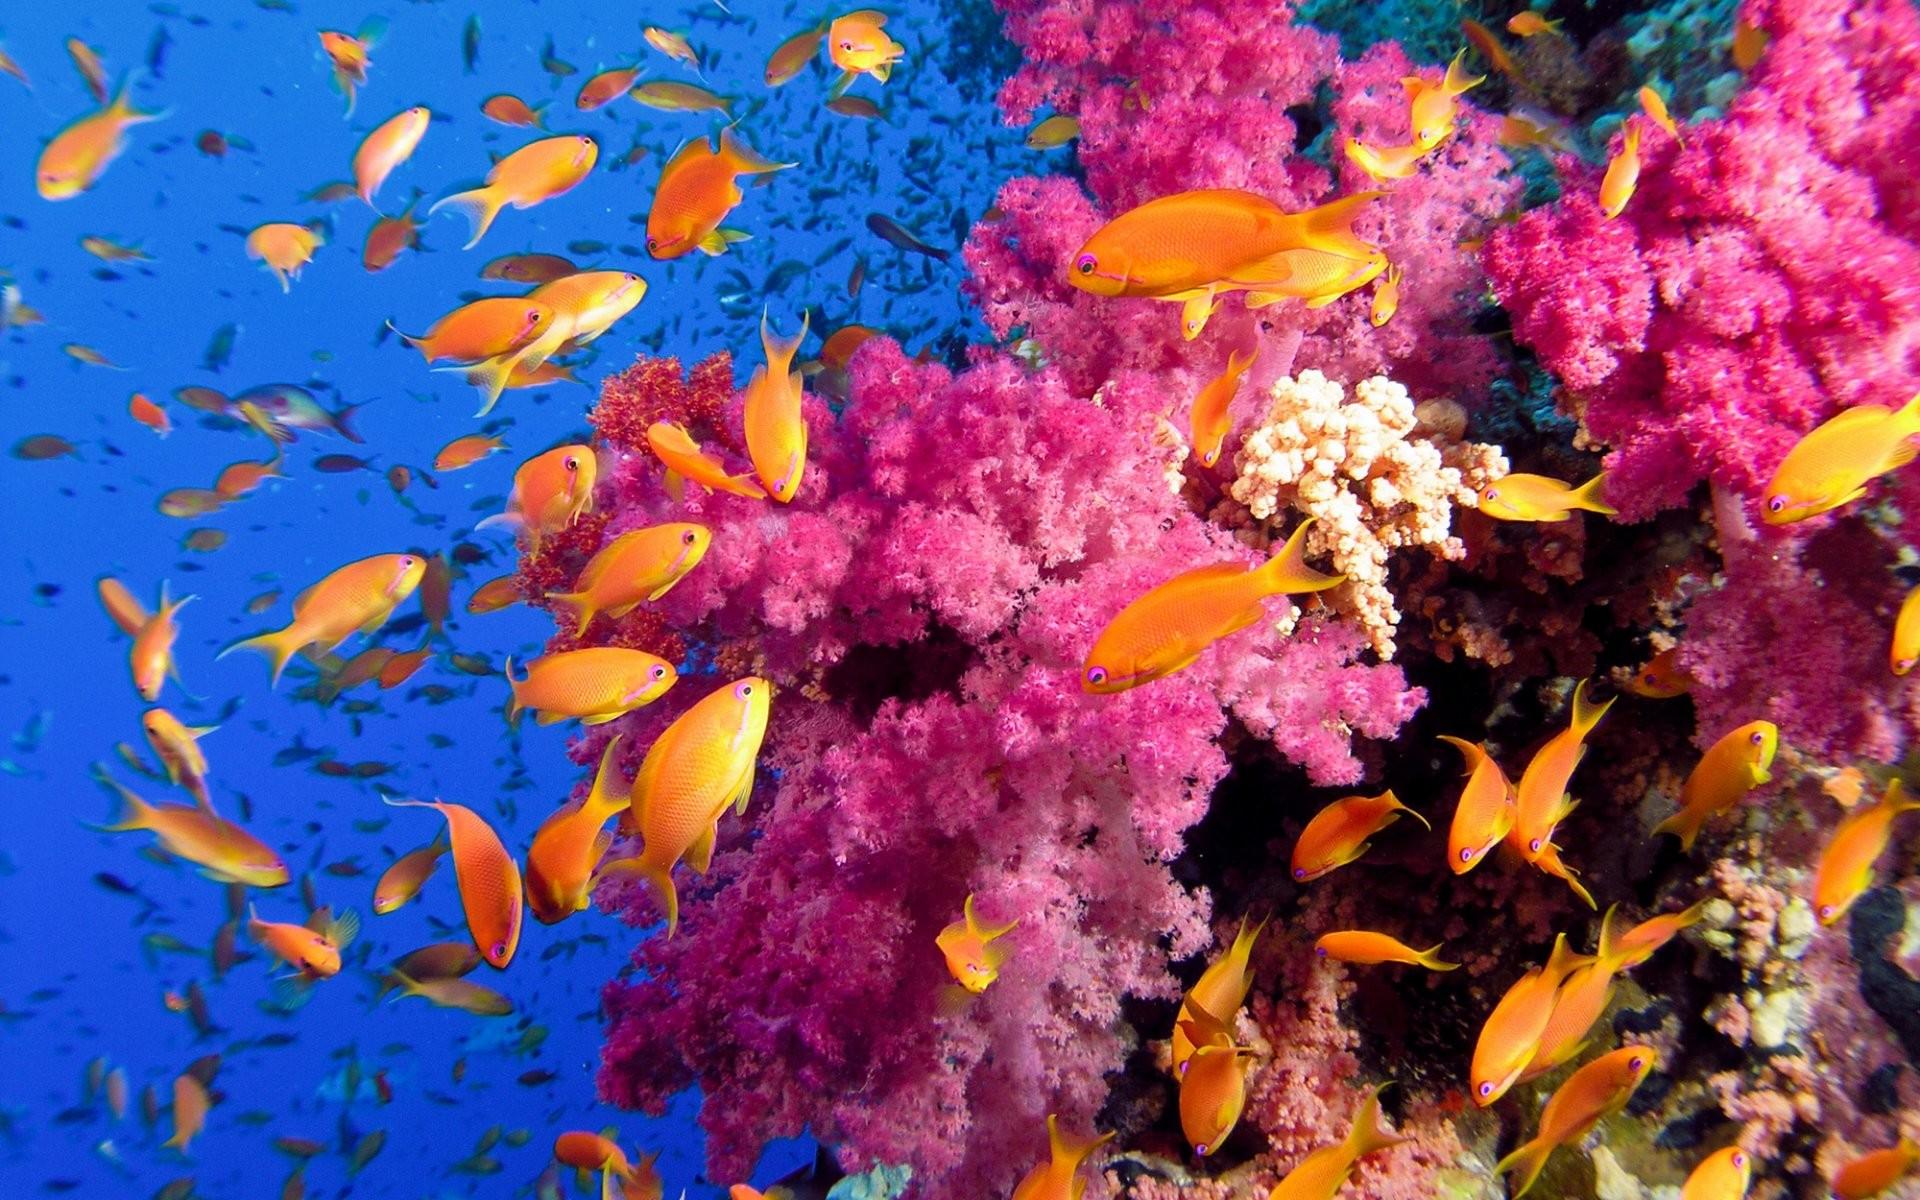 Underwater-colorful-coral-reef-wallpapers ~ Coral Reef Desktop Wallpaper:  Coral